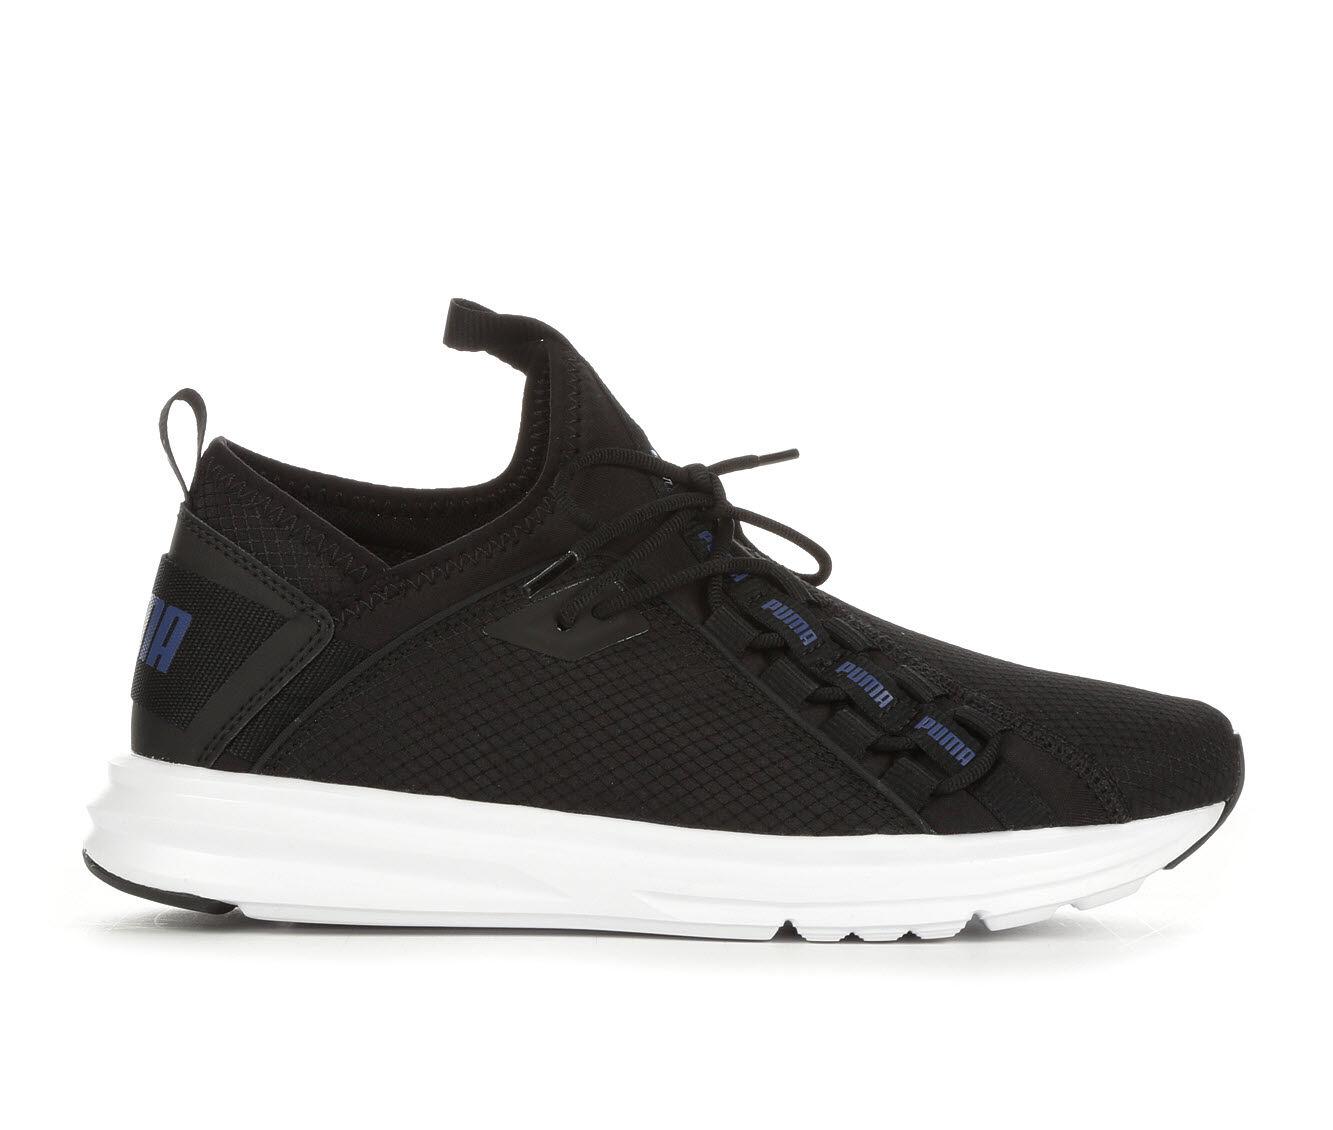 Men's Puma Enzo Peak Escape Sneakers Black/Blue